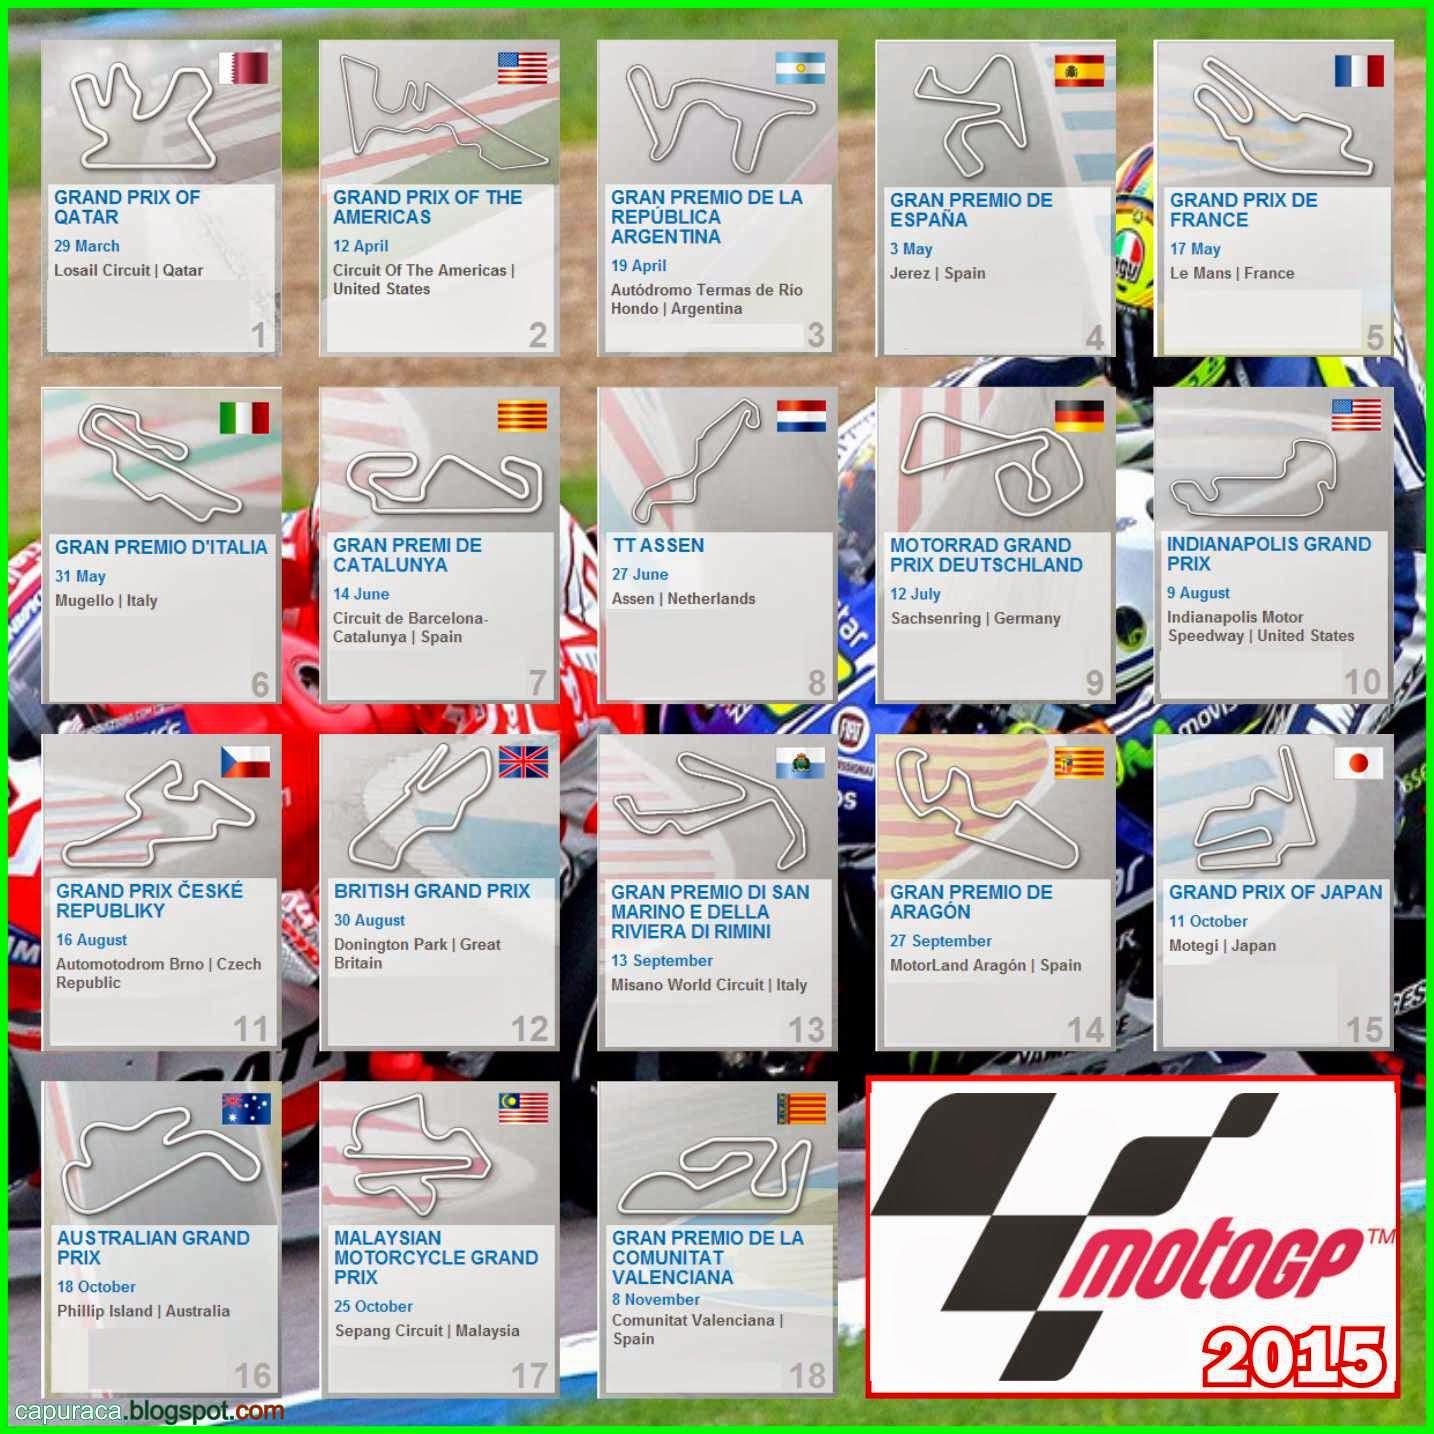 Informasi lengkap jadwal race motogp 2015 Trans7,jadwal balap motogp trans7